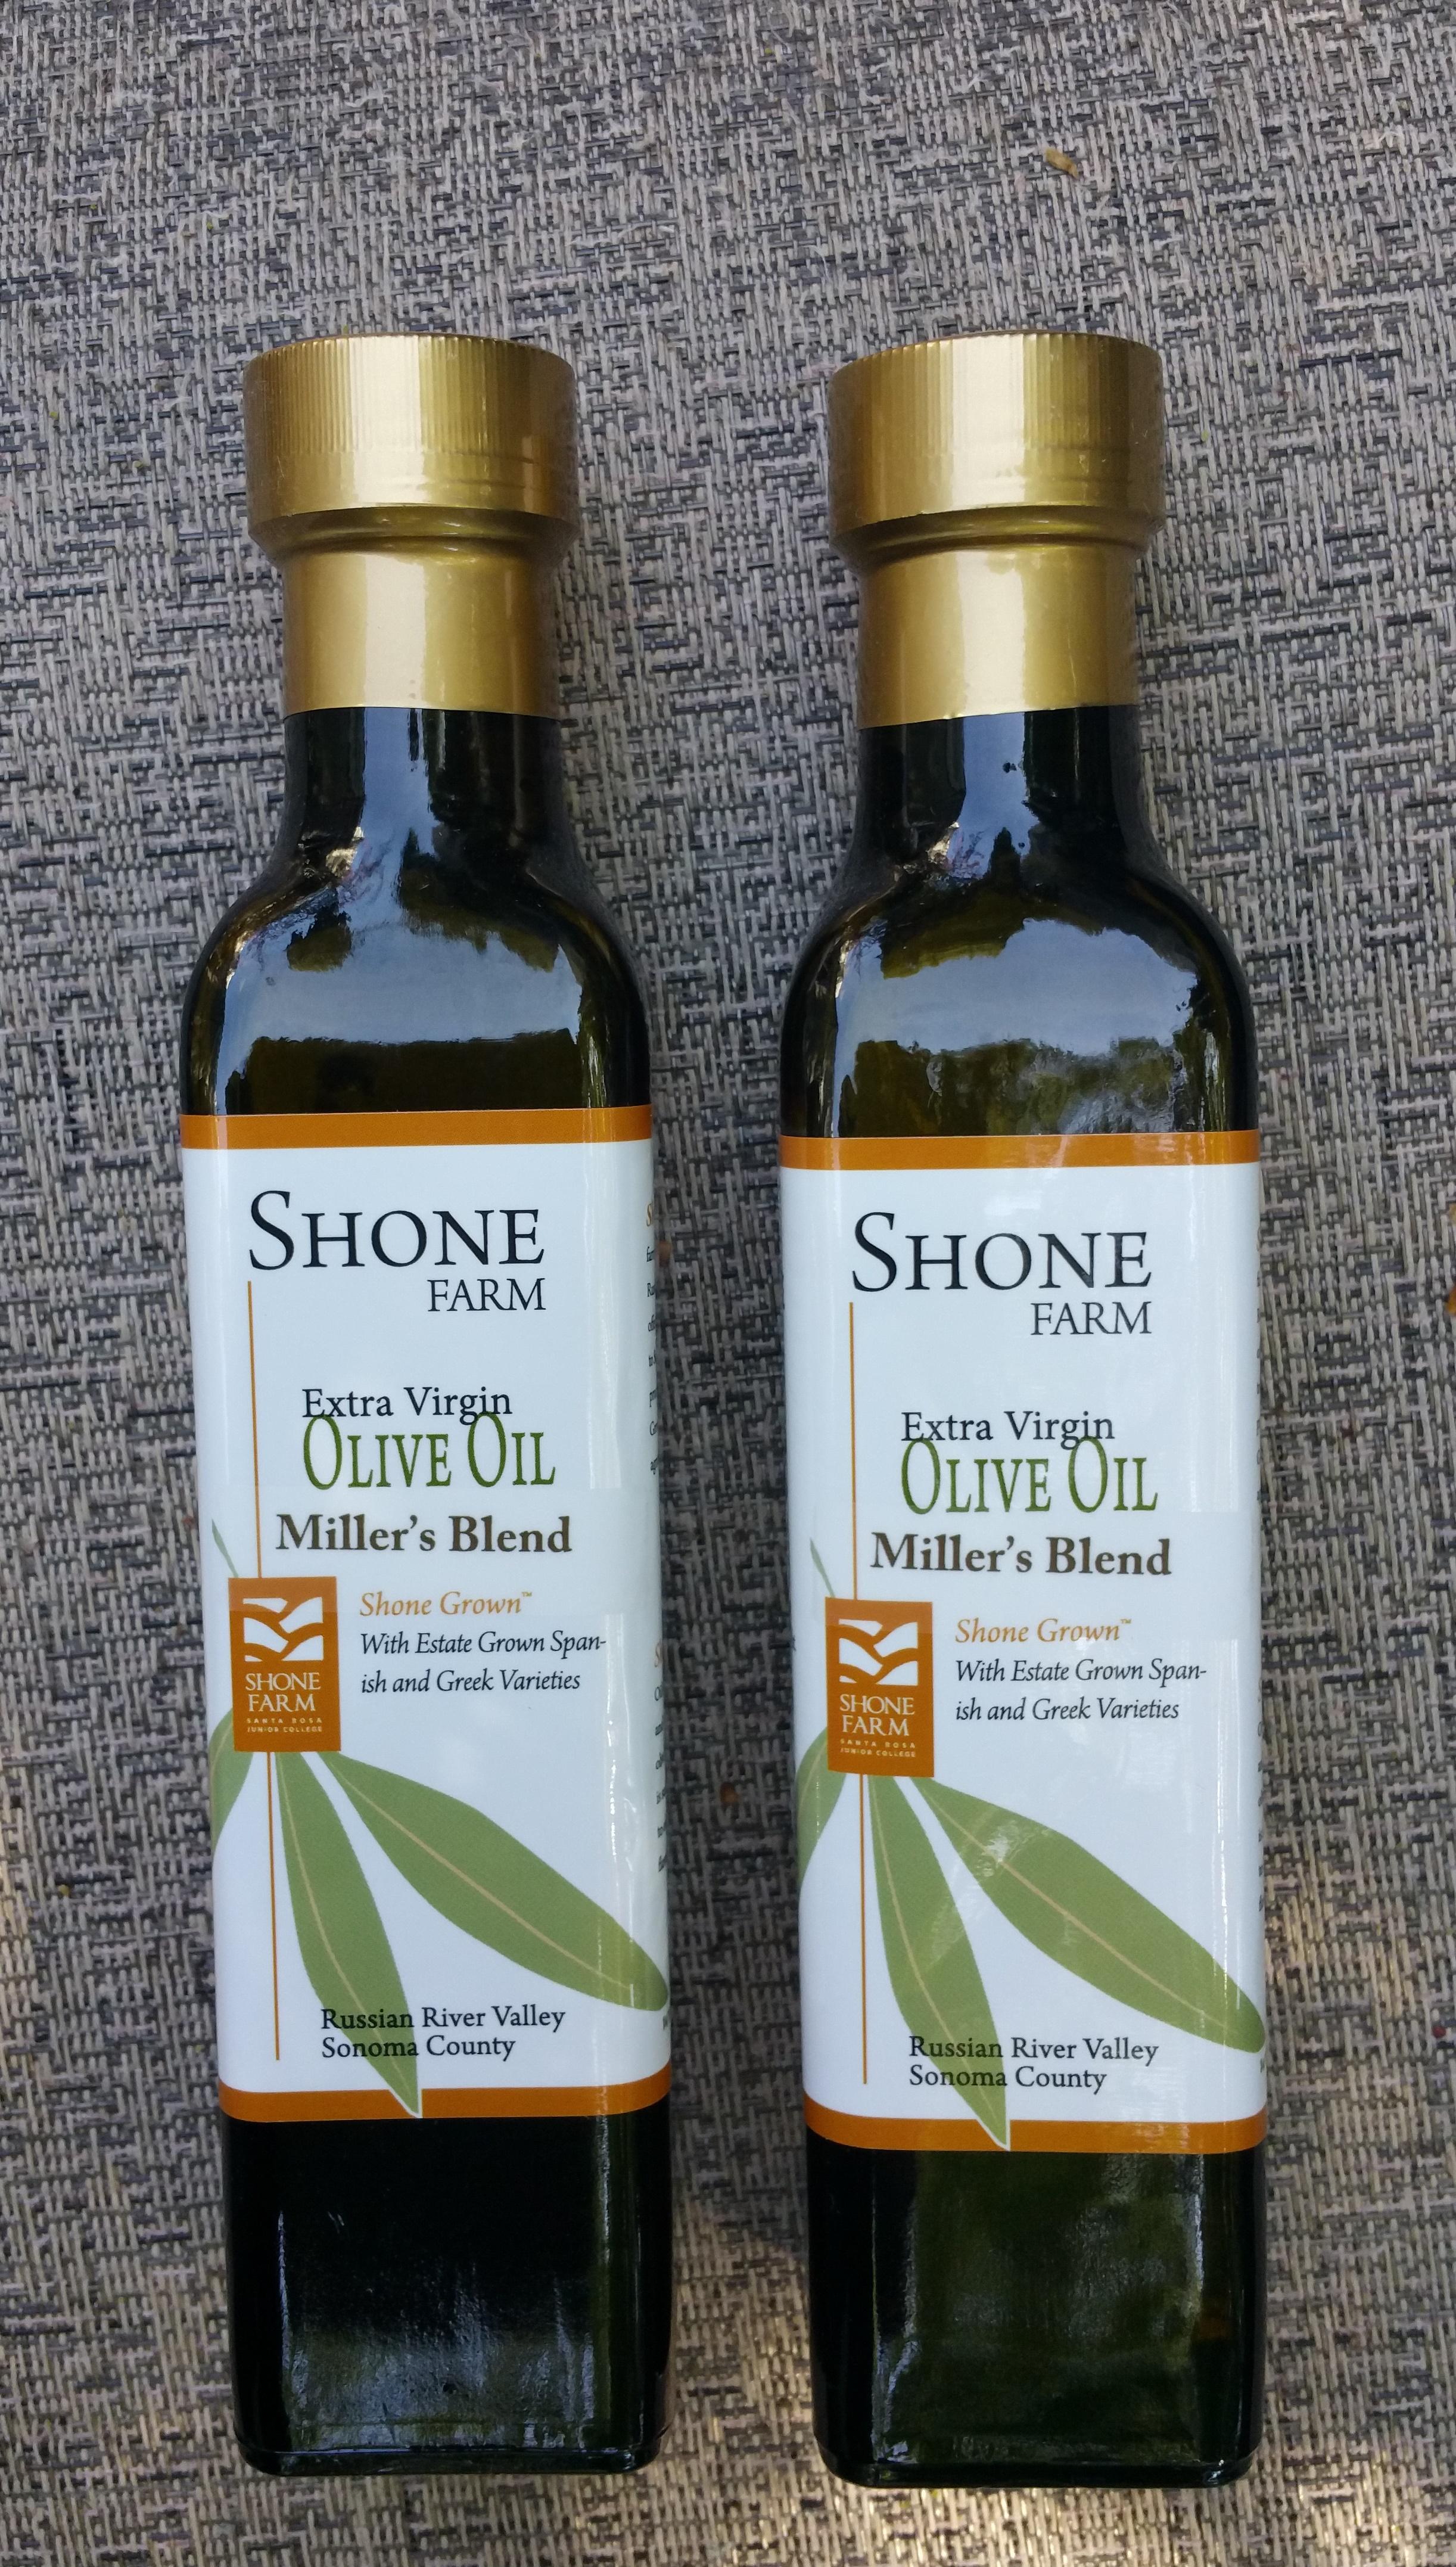 http://asfccc.com/wp-content/uploads/2015/04/Shone-Farm-Olive-Oil-SRJC.jpg